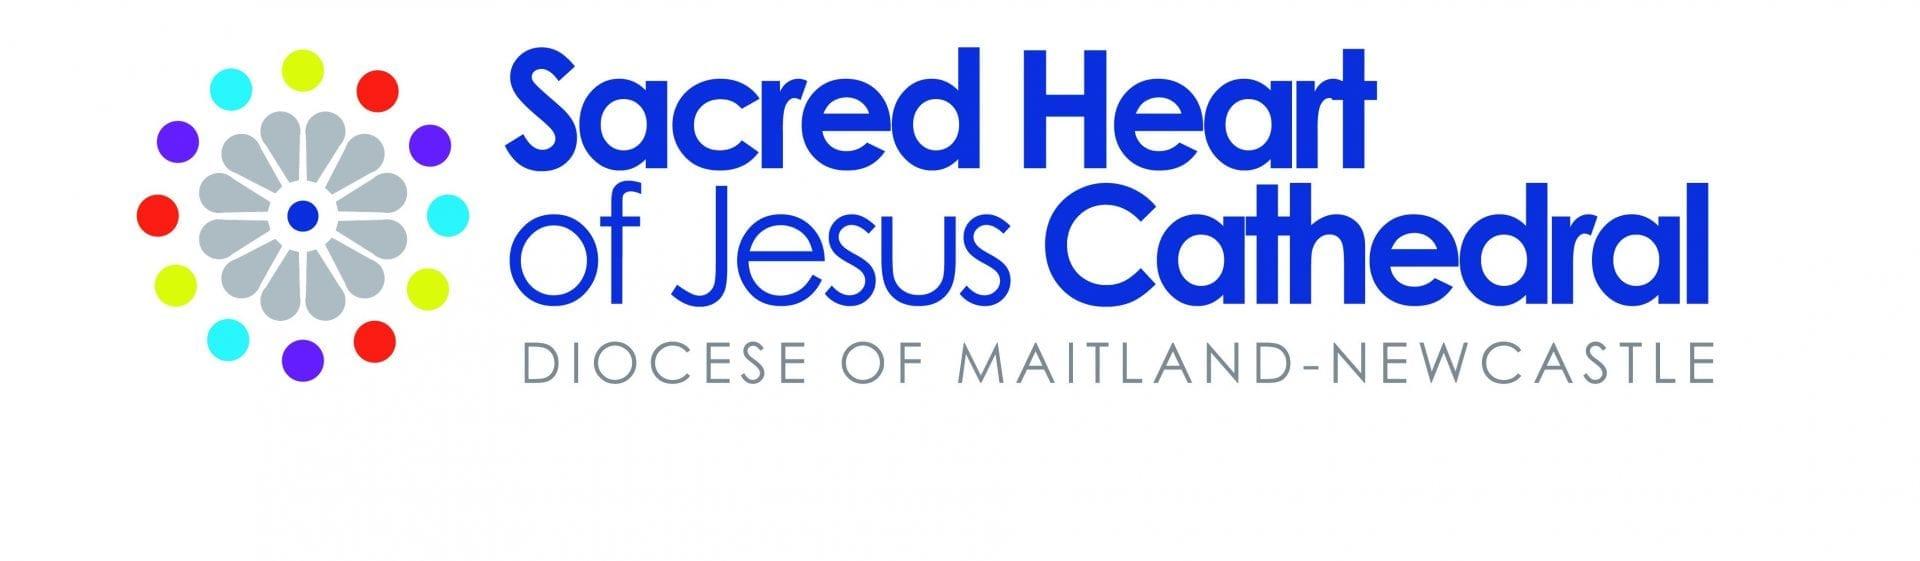 Sacred Heart Cathedral-01-Header